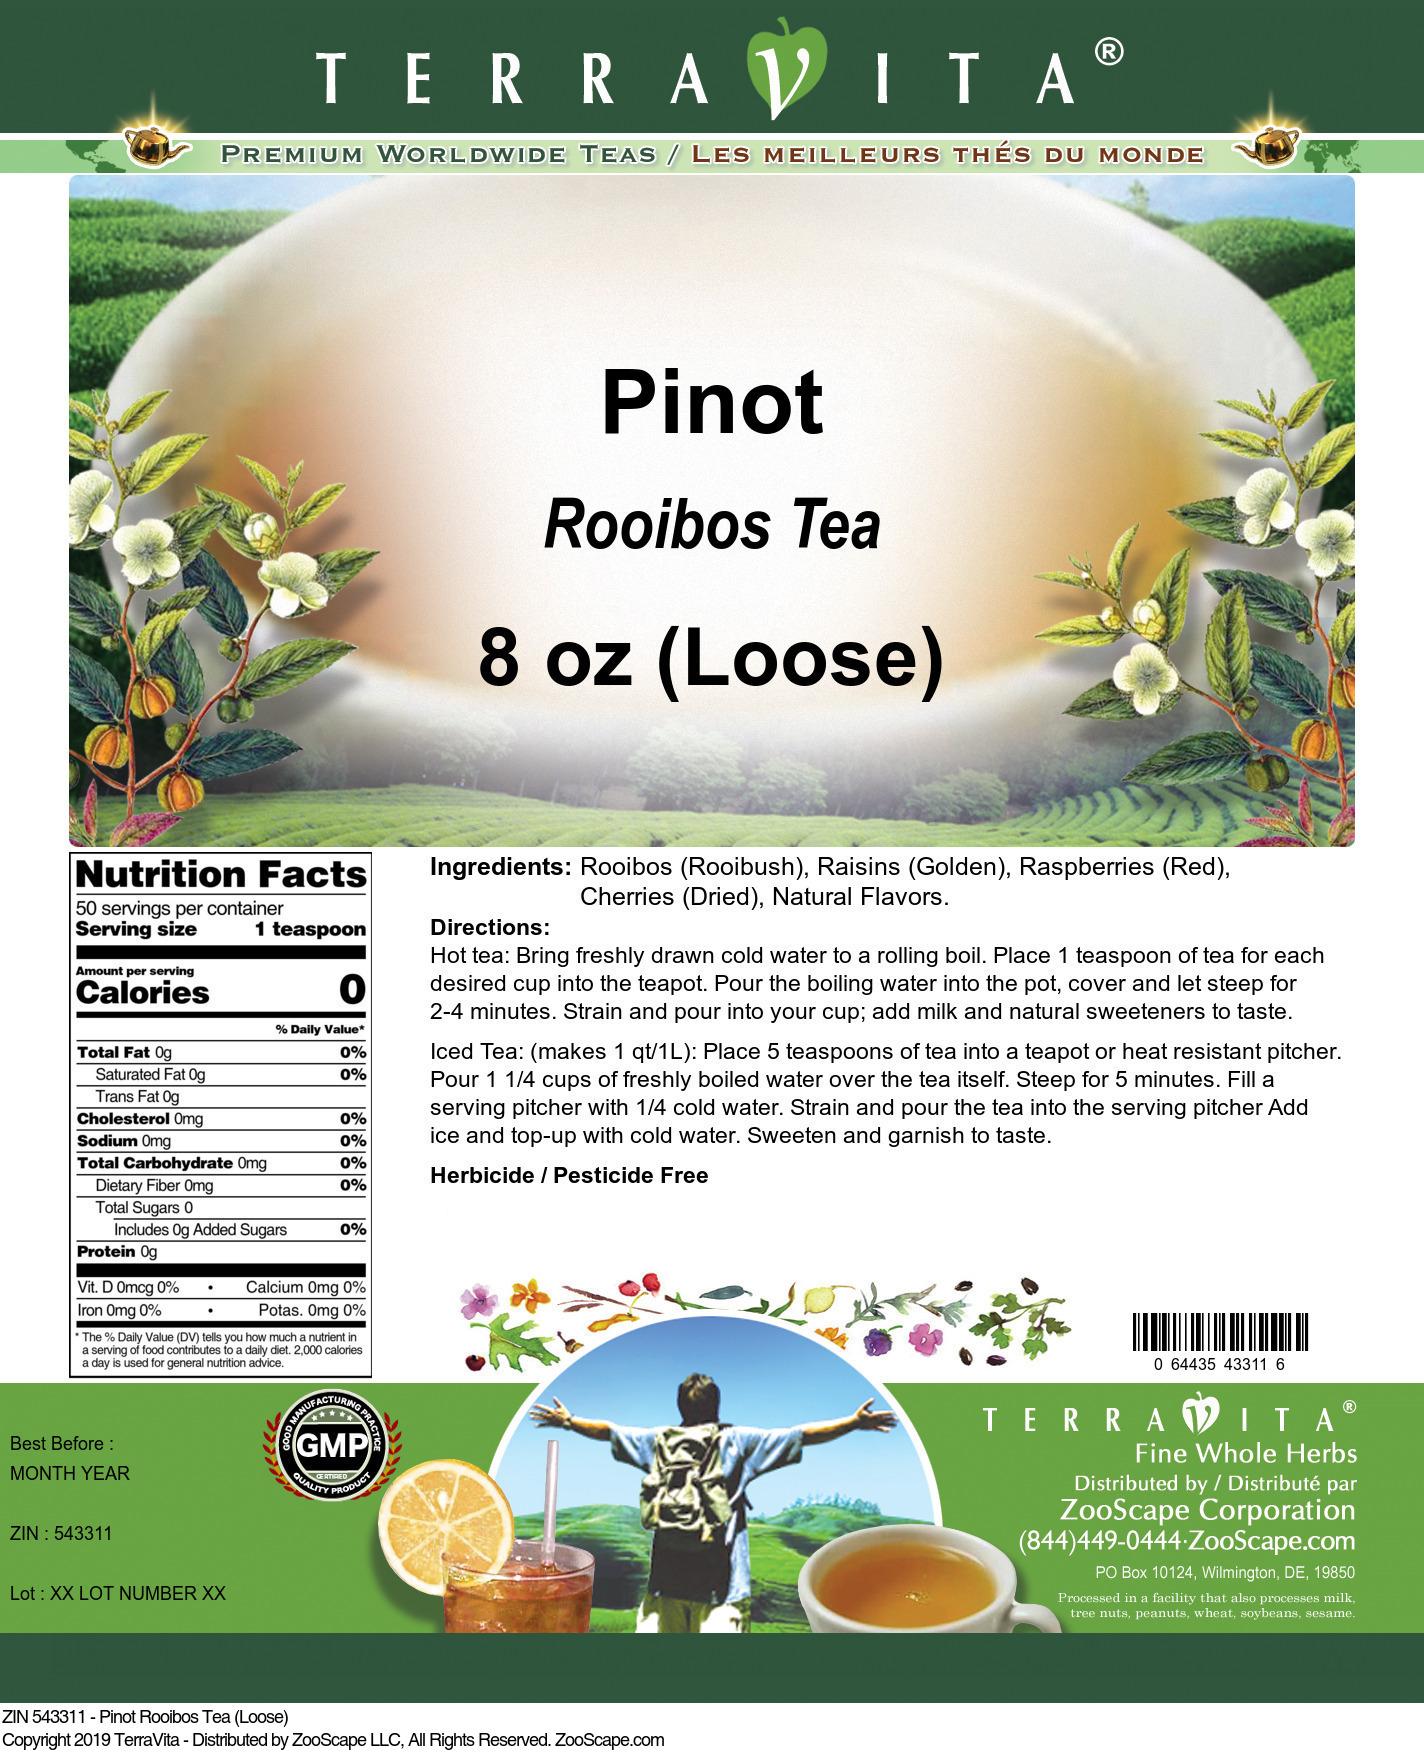 Pinot Rooibos Tea (Loose)